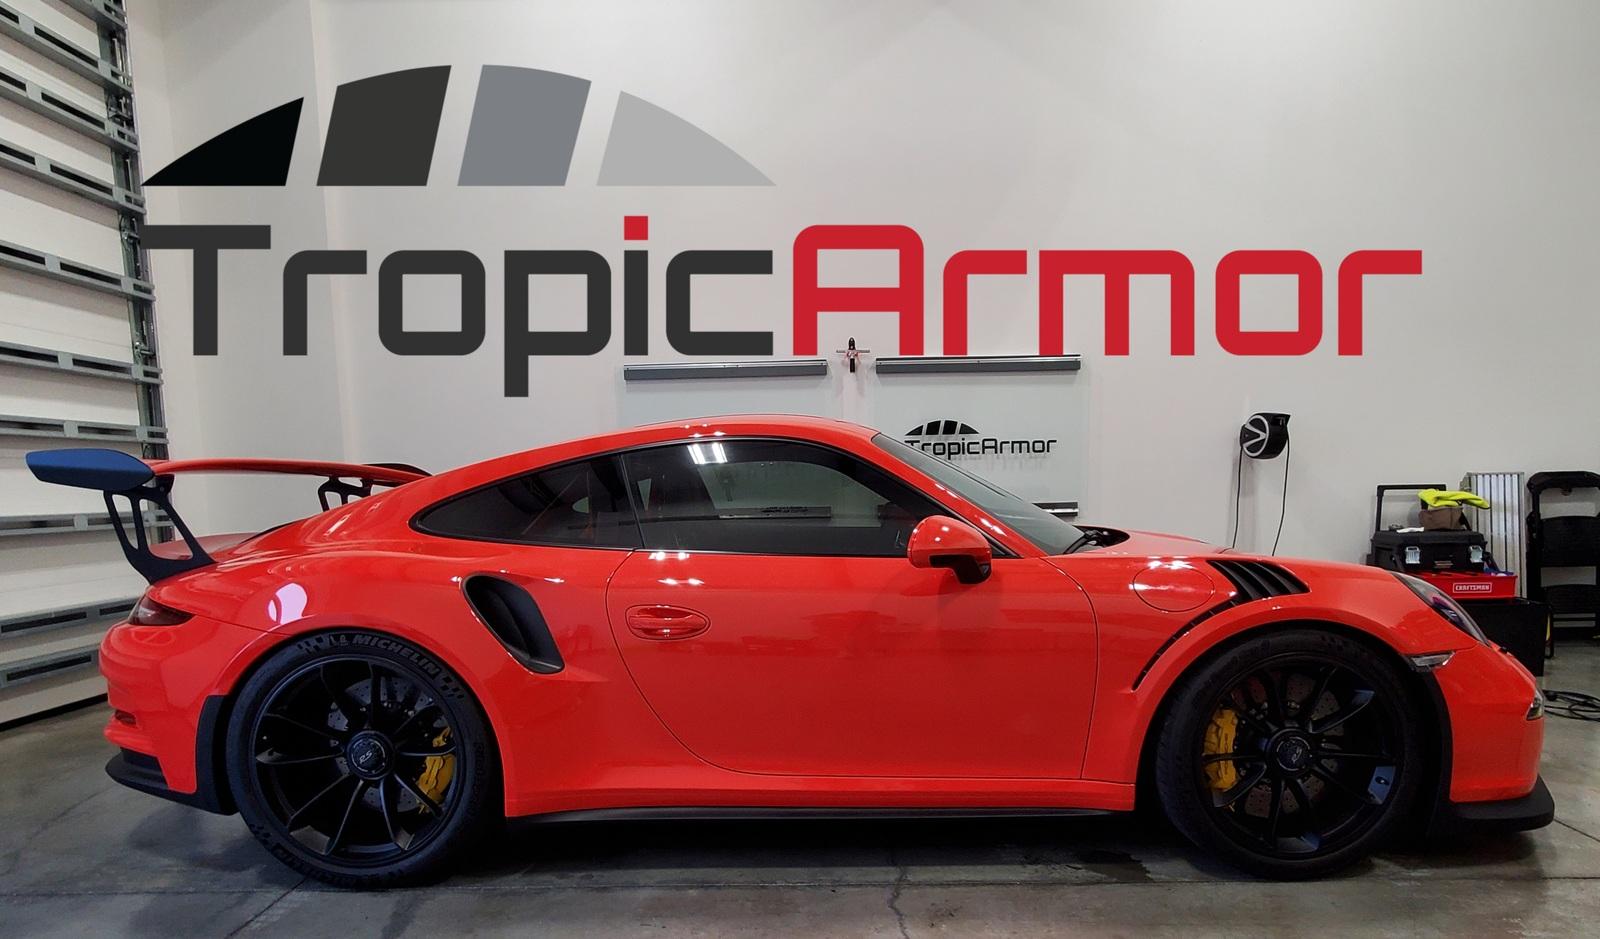 Tropic Armor Naples automotive window tinting